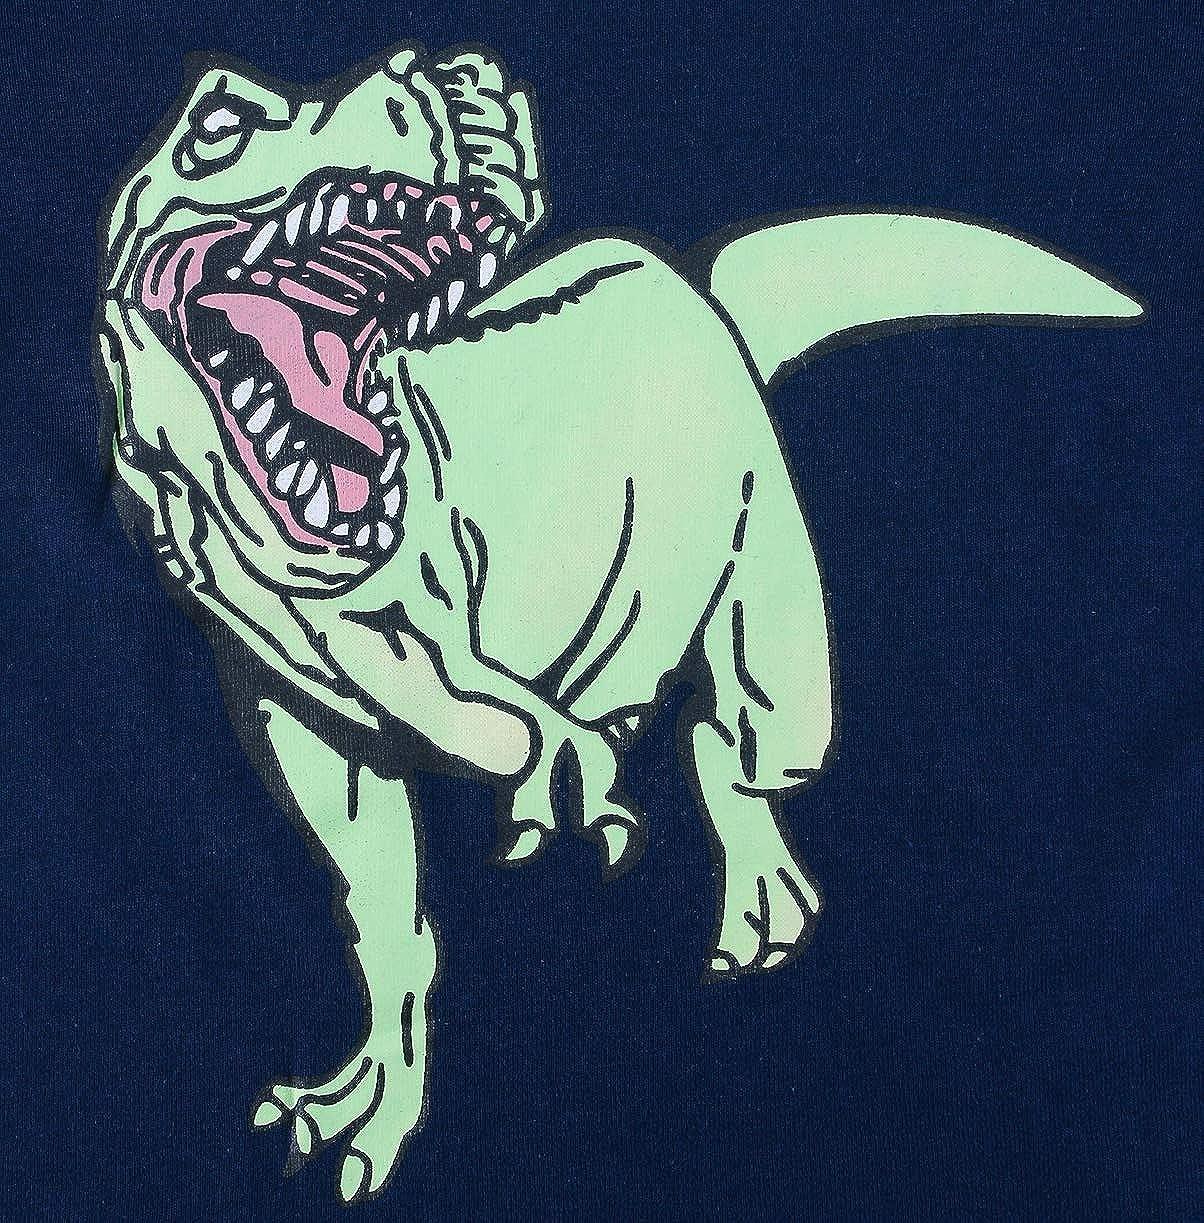 HIKIDS Pigiama da Dinosauro Squalo Shark per Ragazzi Pigiama a Maniche Lunga per Ragazzo 100/% di Cotone dai 2 ai 8 Anni